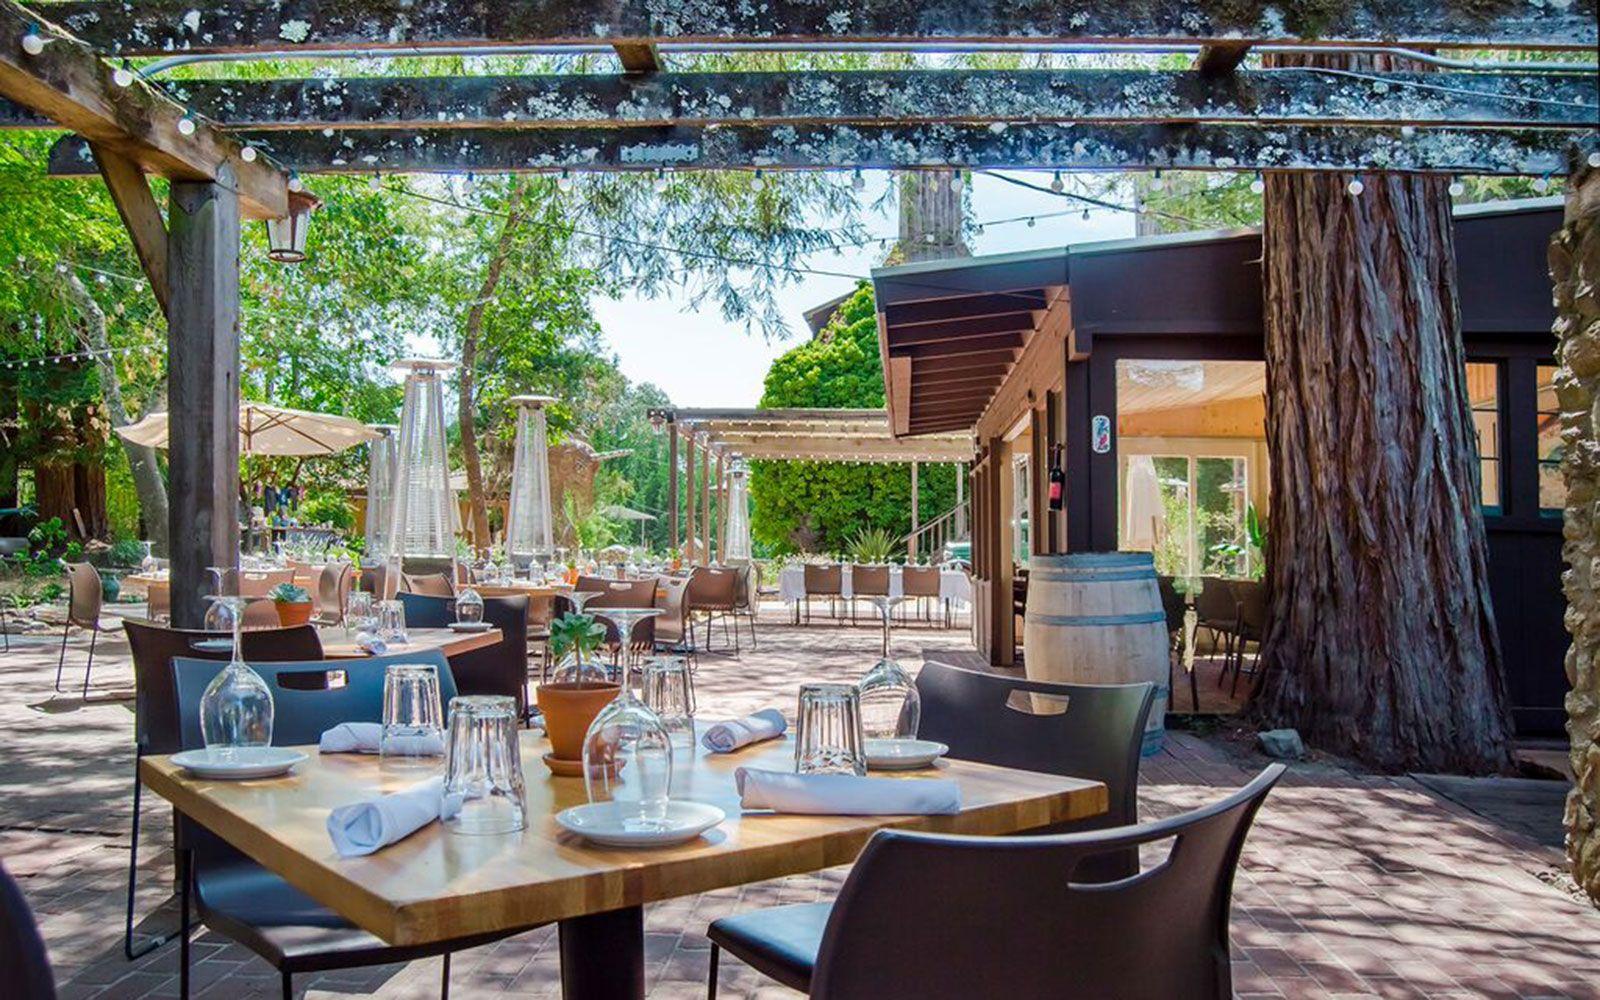 Best outdoor dining restaurants in america forestville